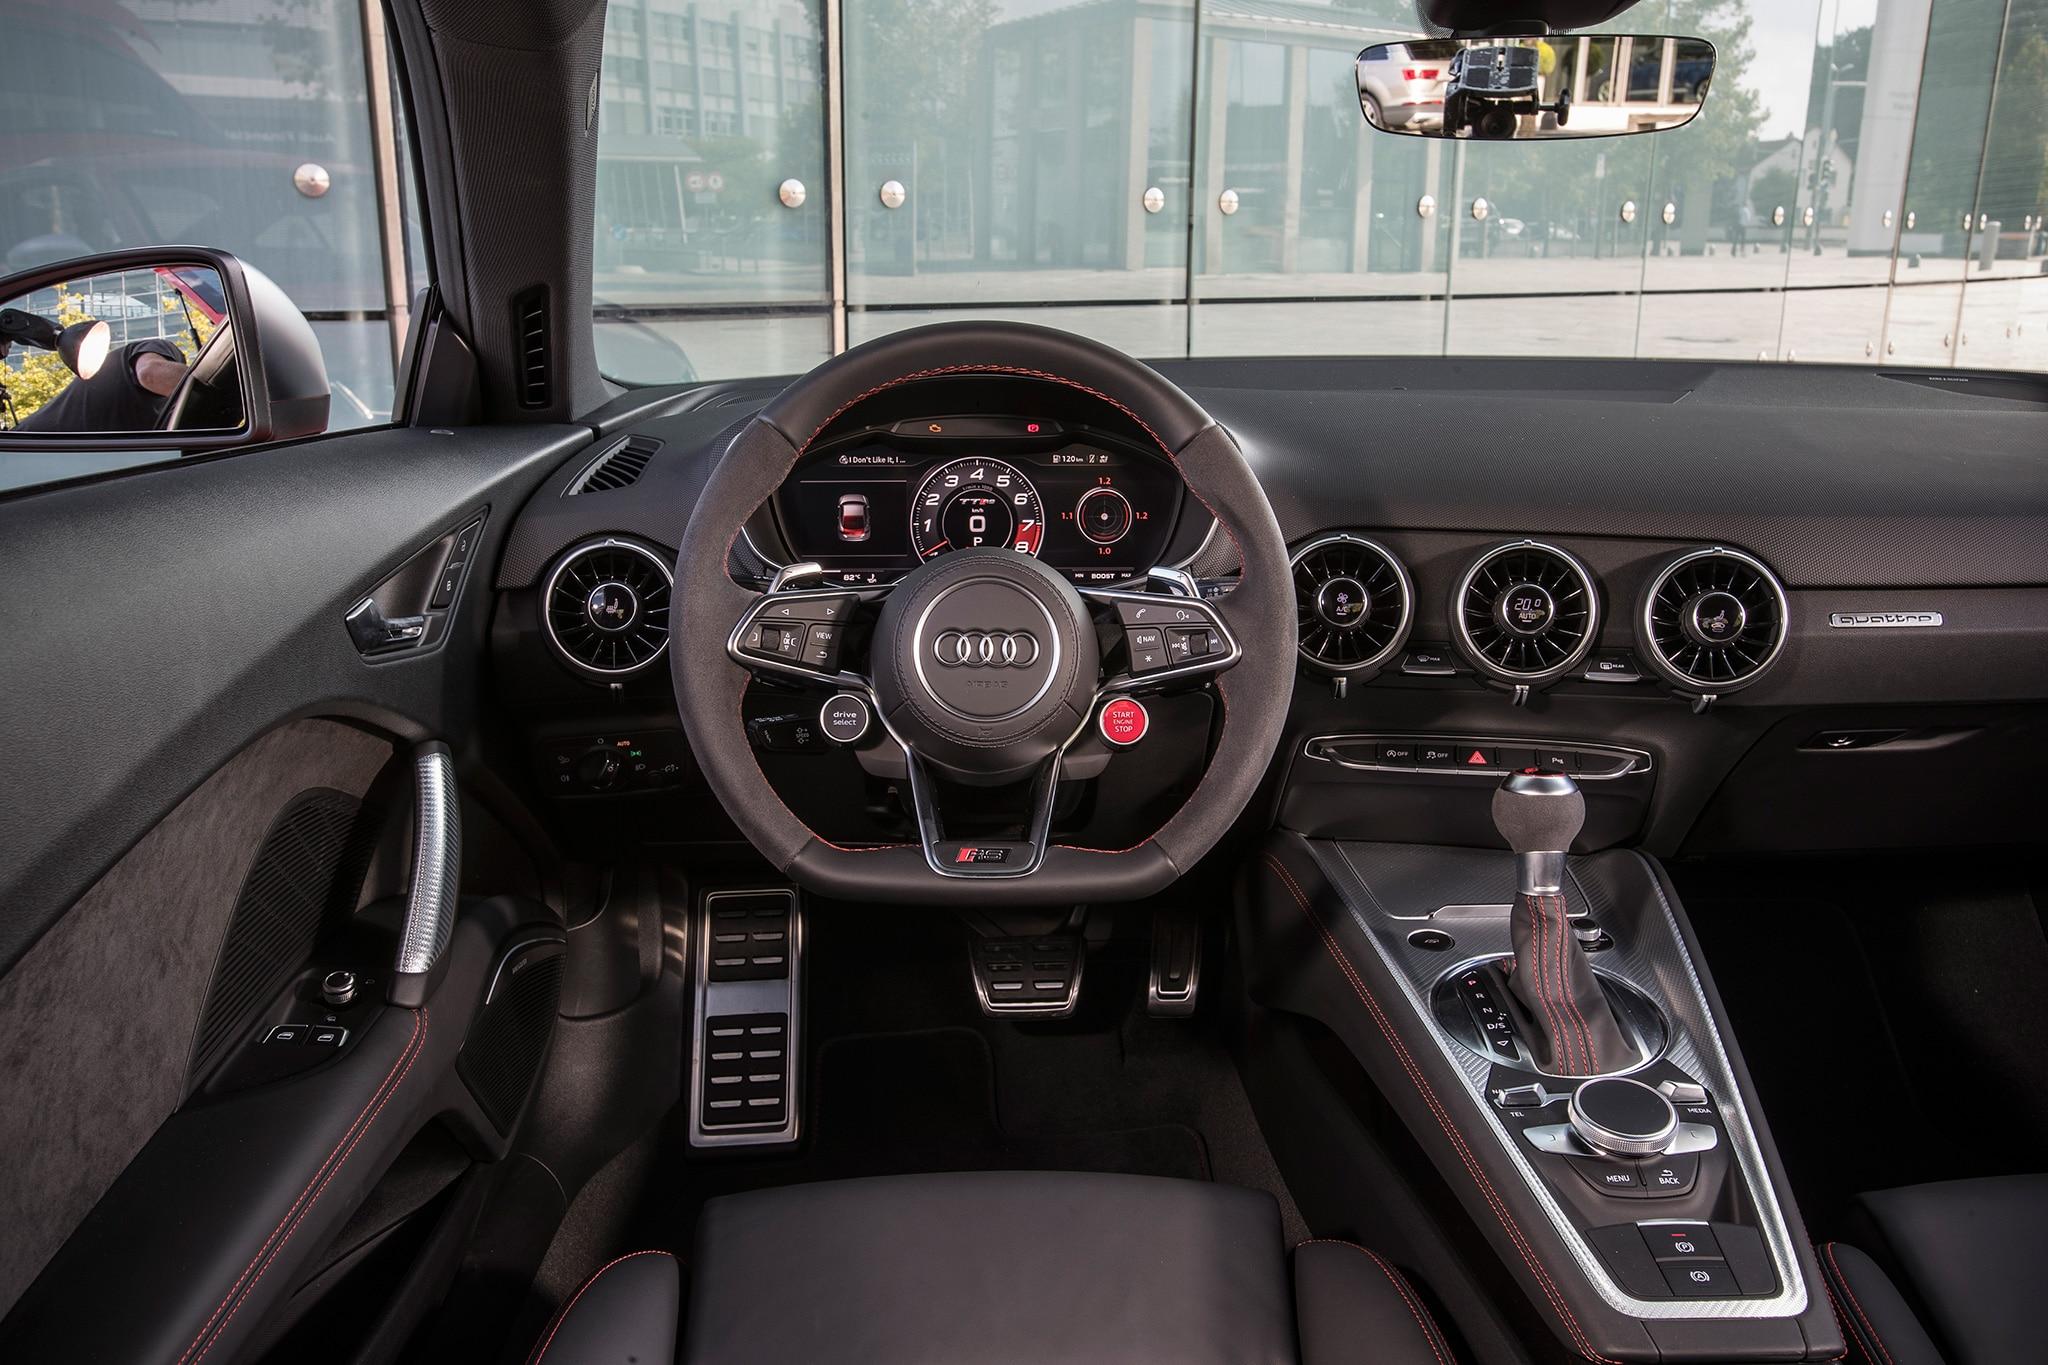 2018 Audi TT RS Dashboard